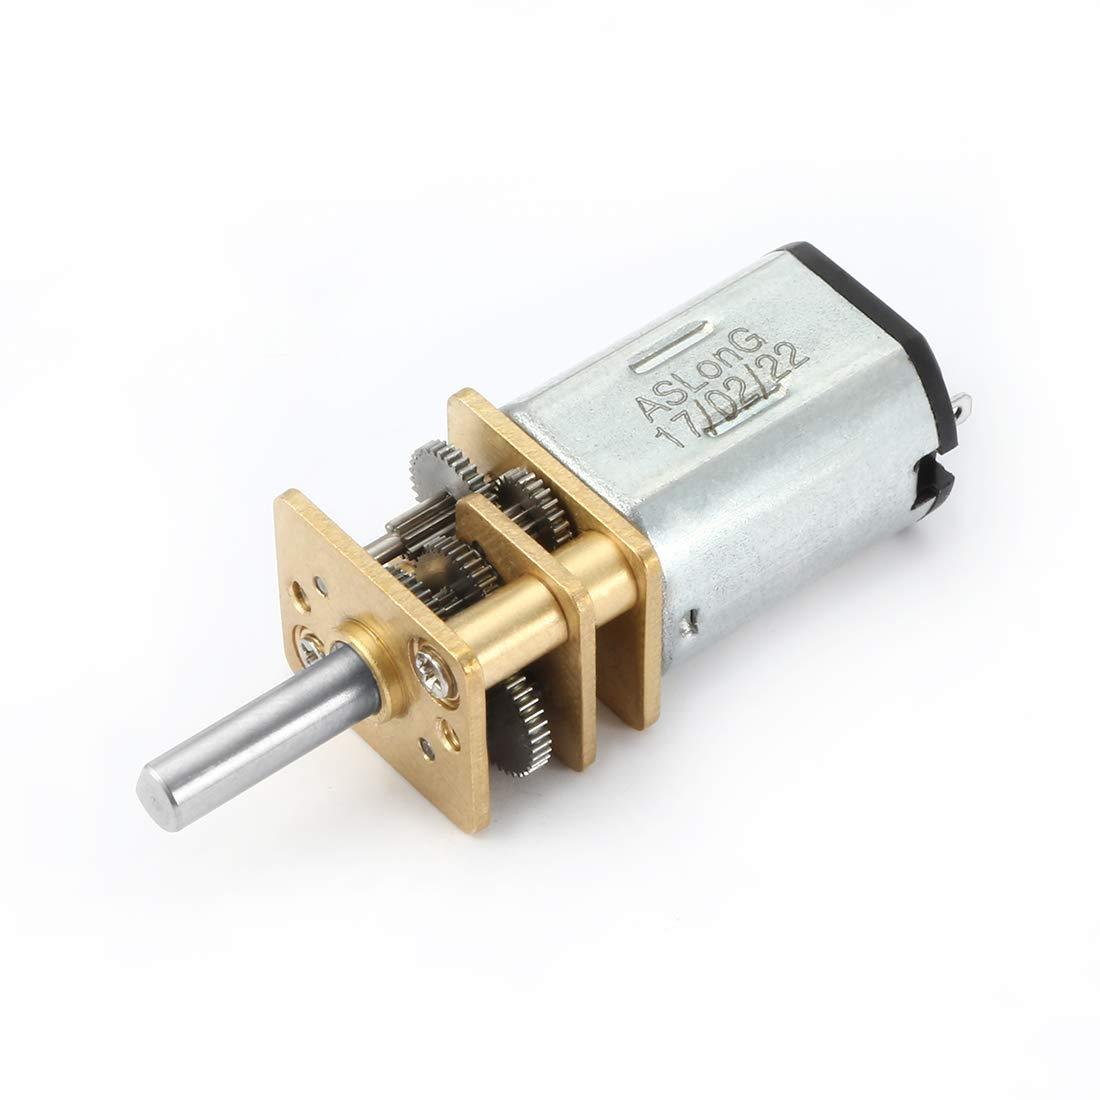 sourcingmap C.C. 6V 100RPM Micro Motorreductor Elé ctrico Reducció n de Velocidad Caja de Engranajes US-SA-AJD-329130